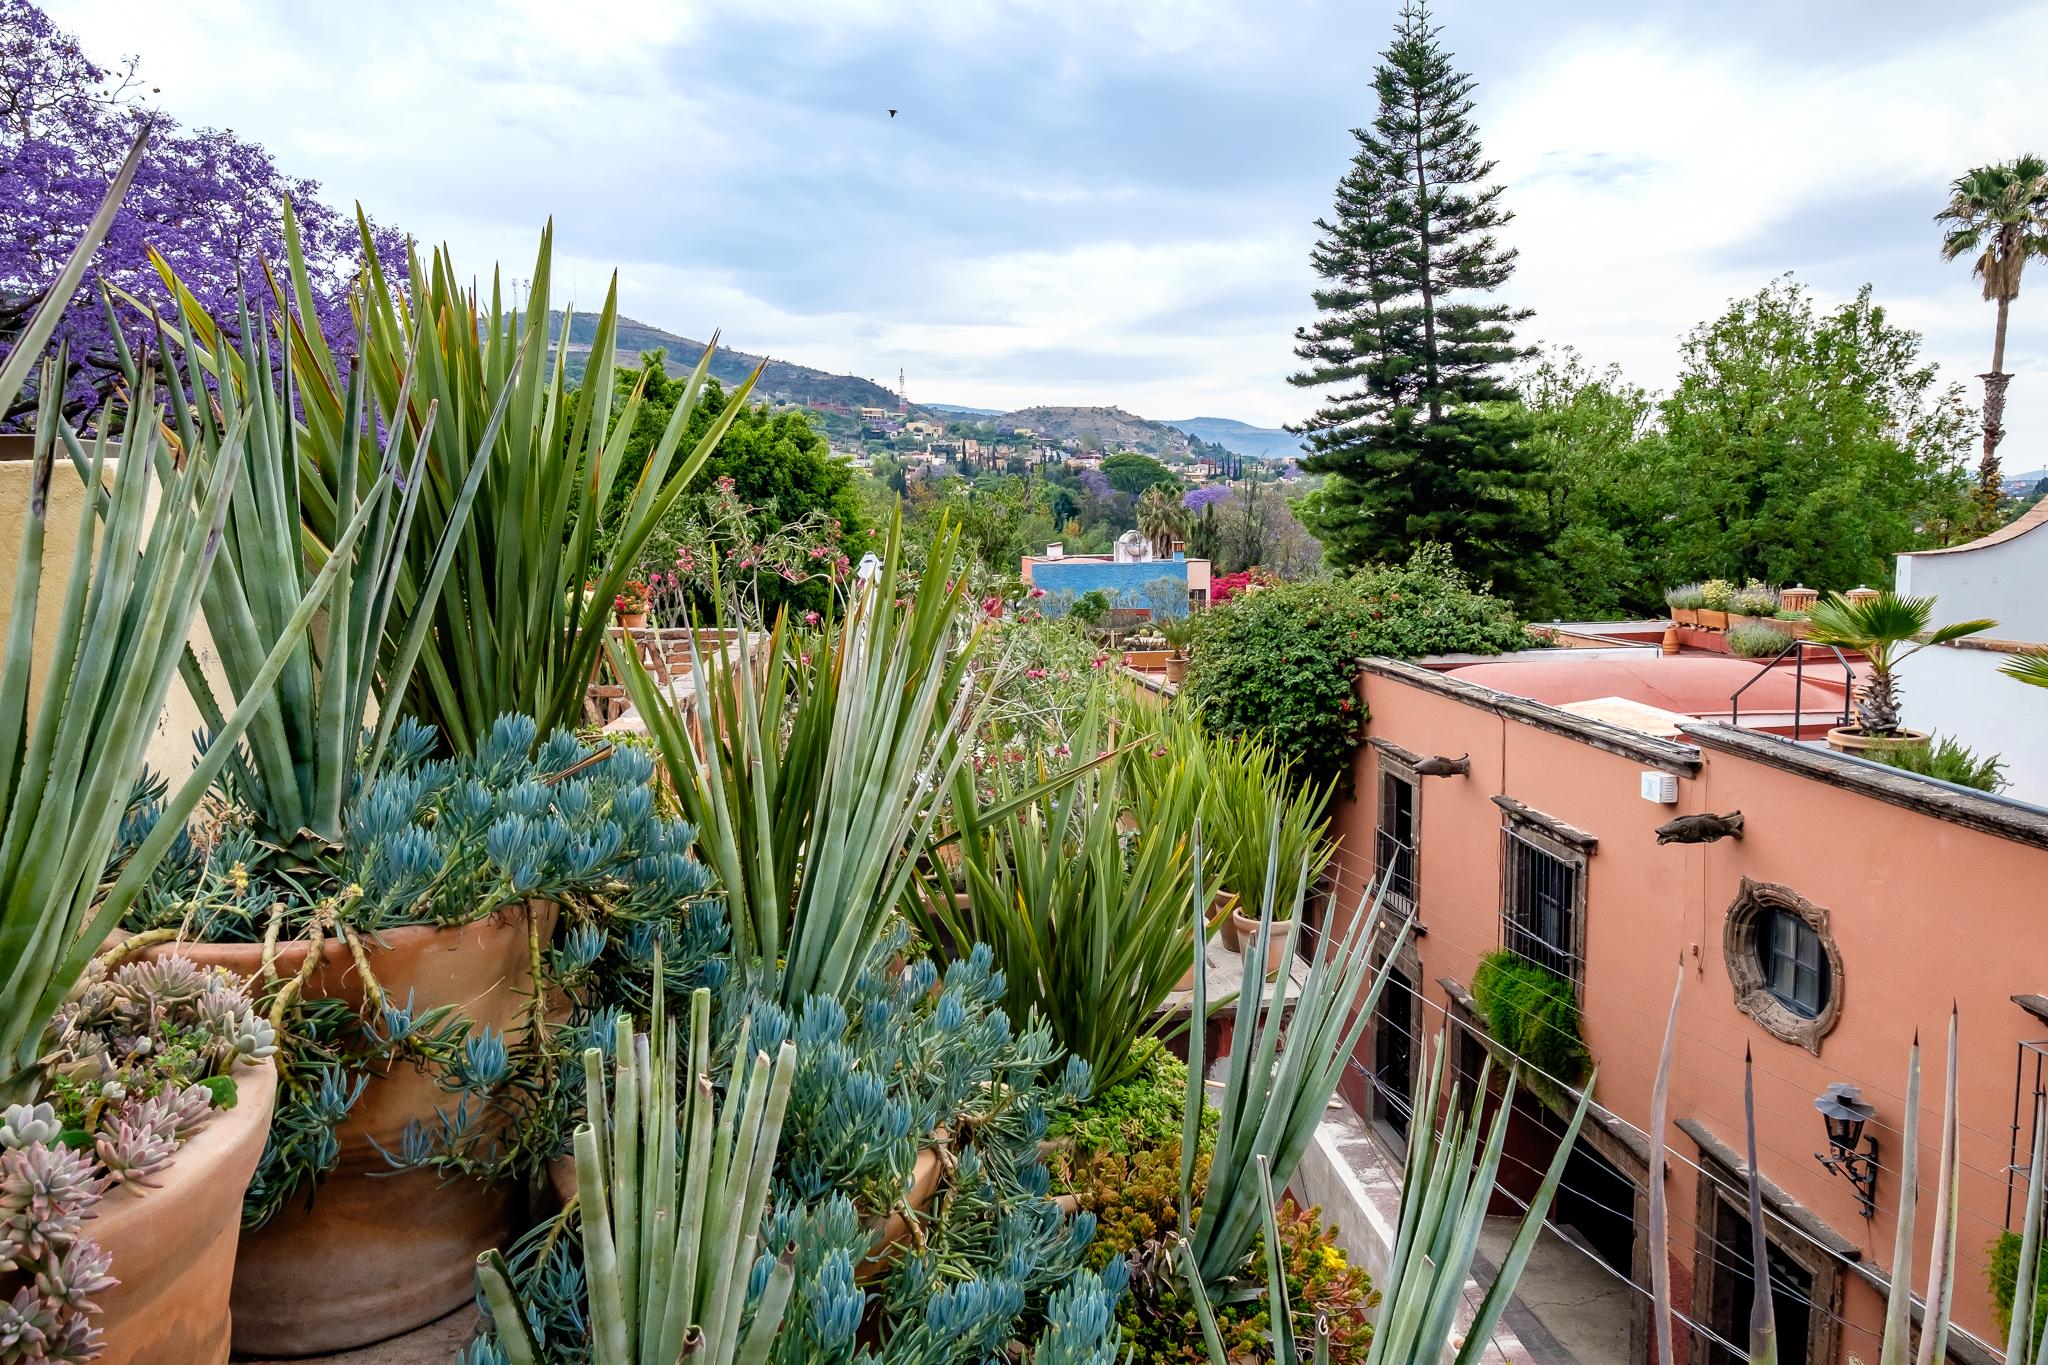 View facing south